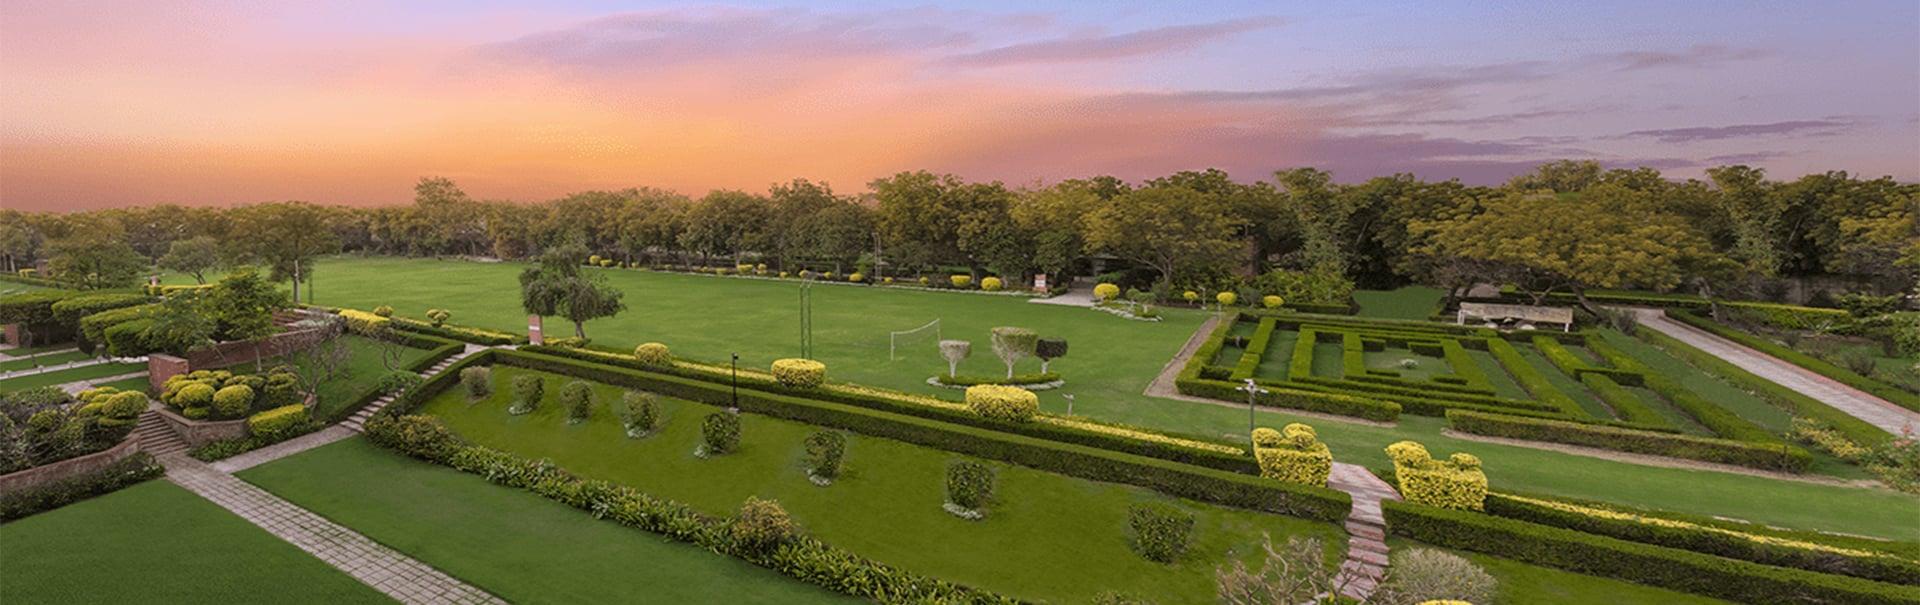 Delhi Agra with ITC Hotels (SHNI7) Banner